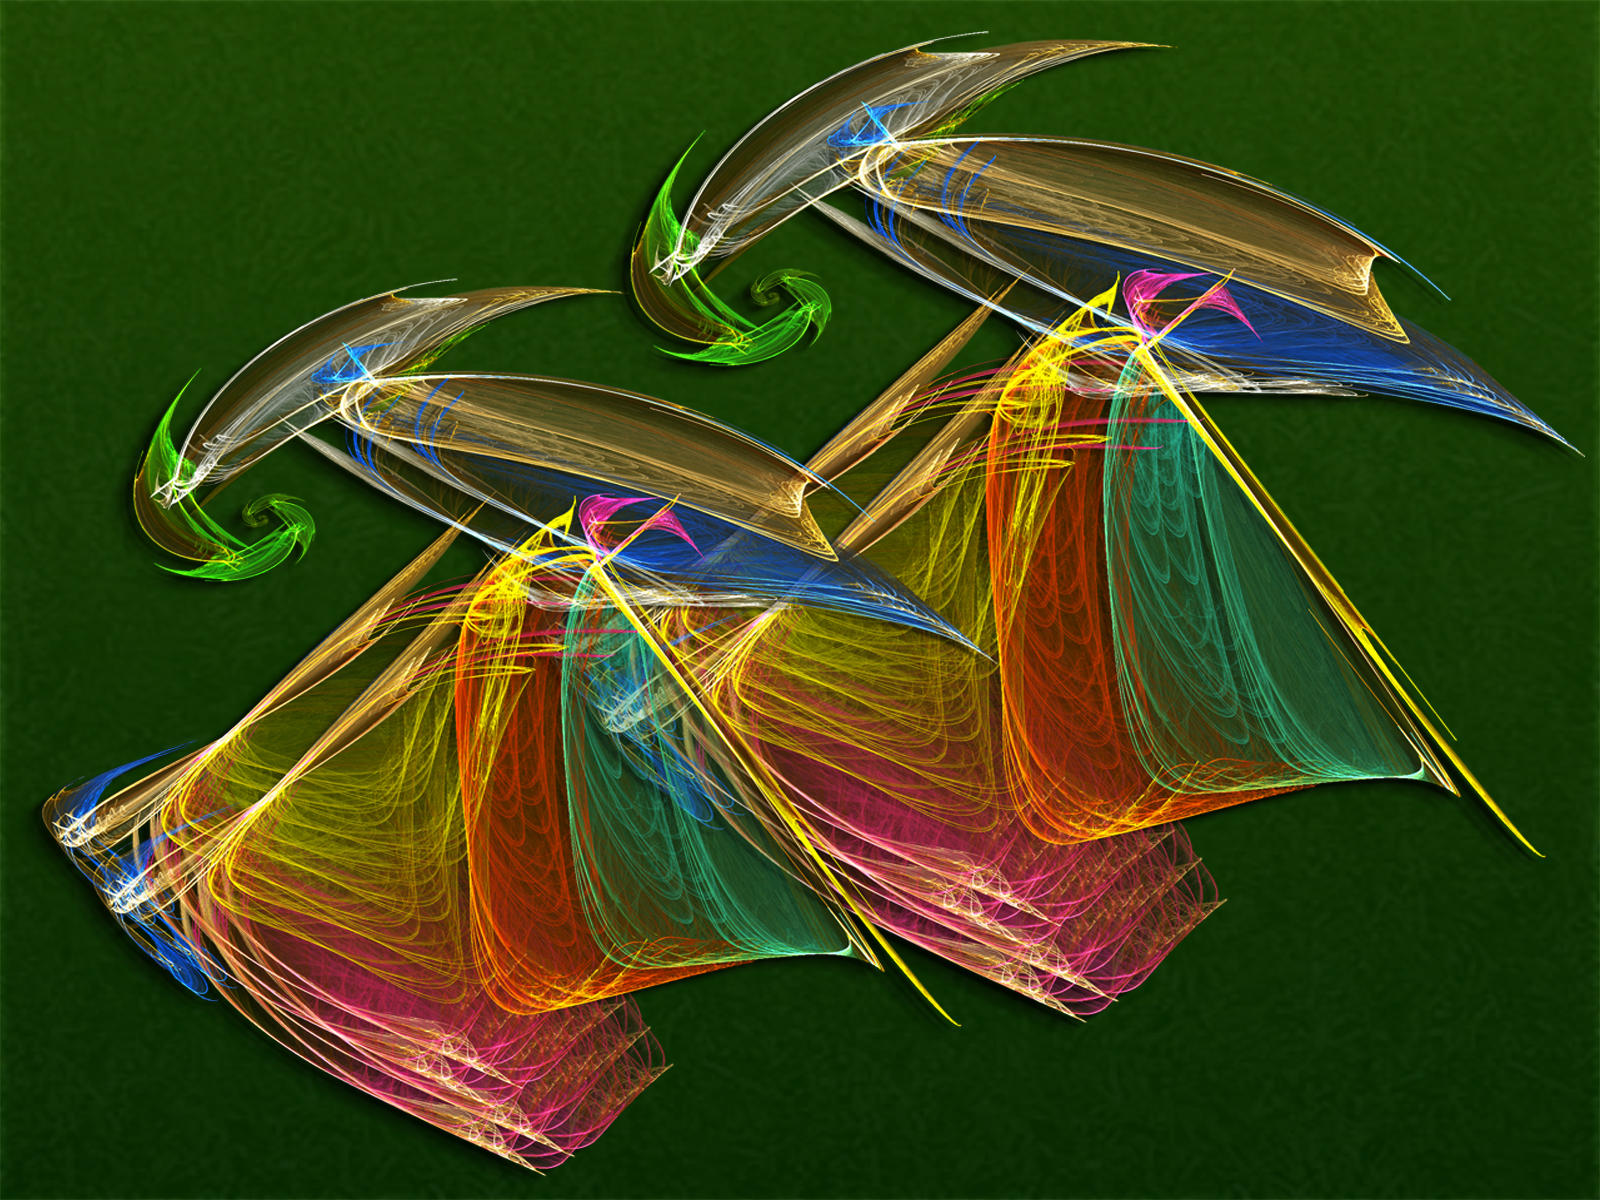 Grasshoppers by Frankief